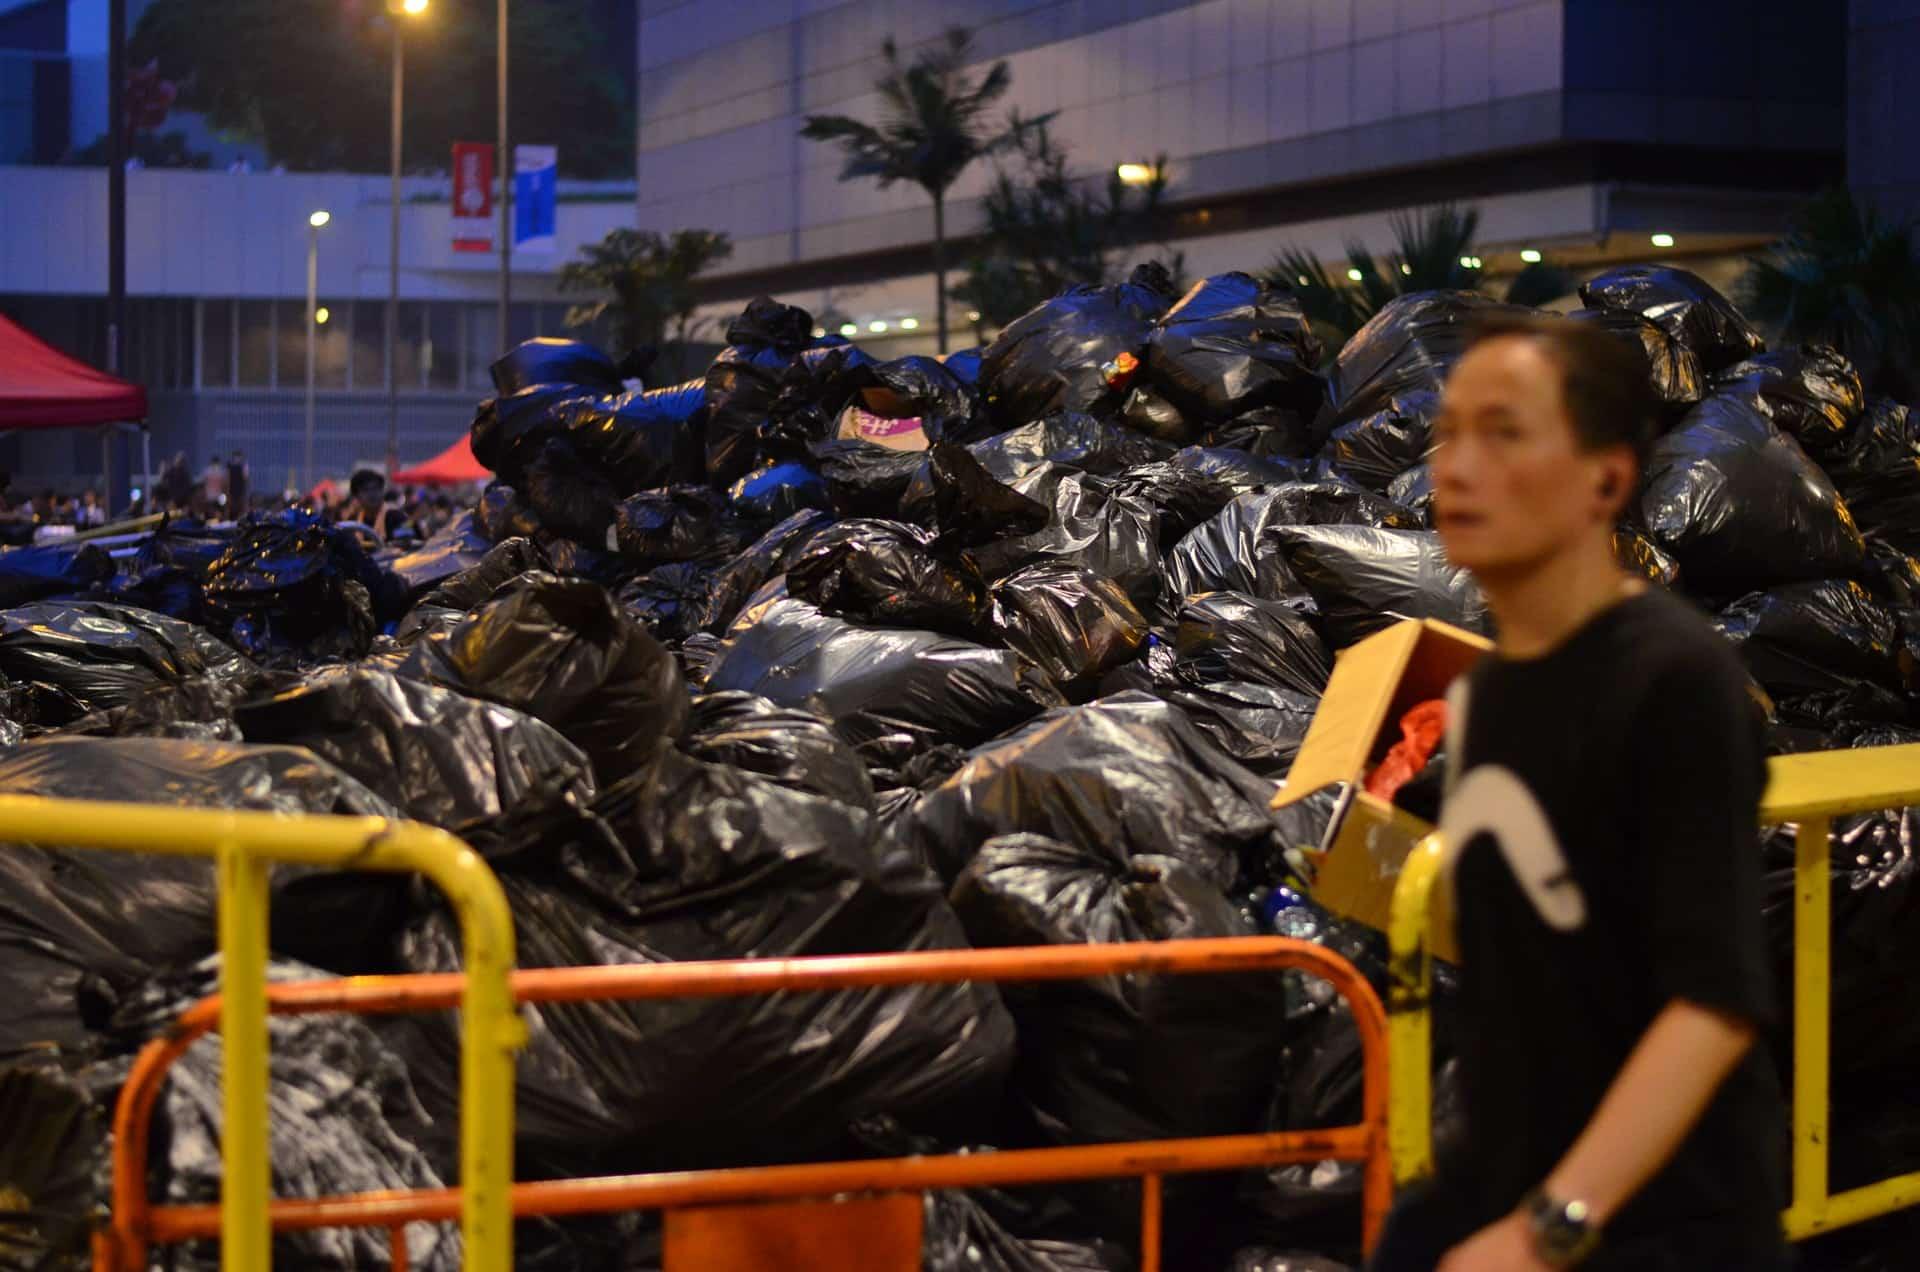 Commercial Trash Compactor Business Header Image